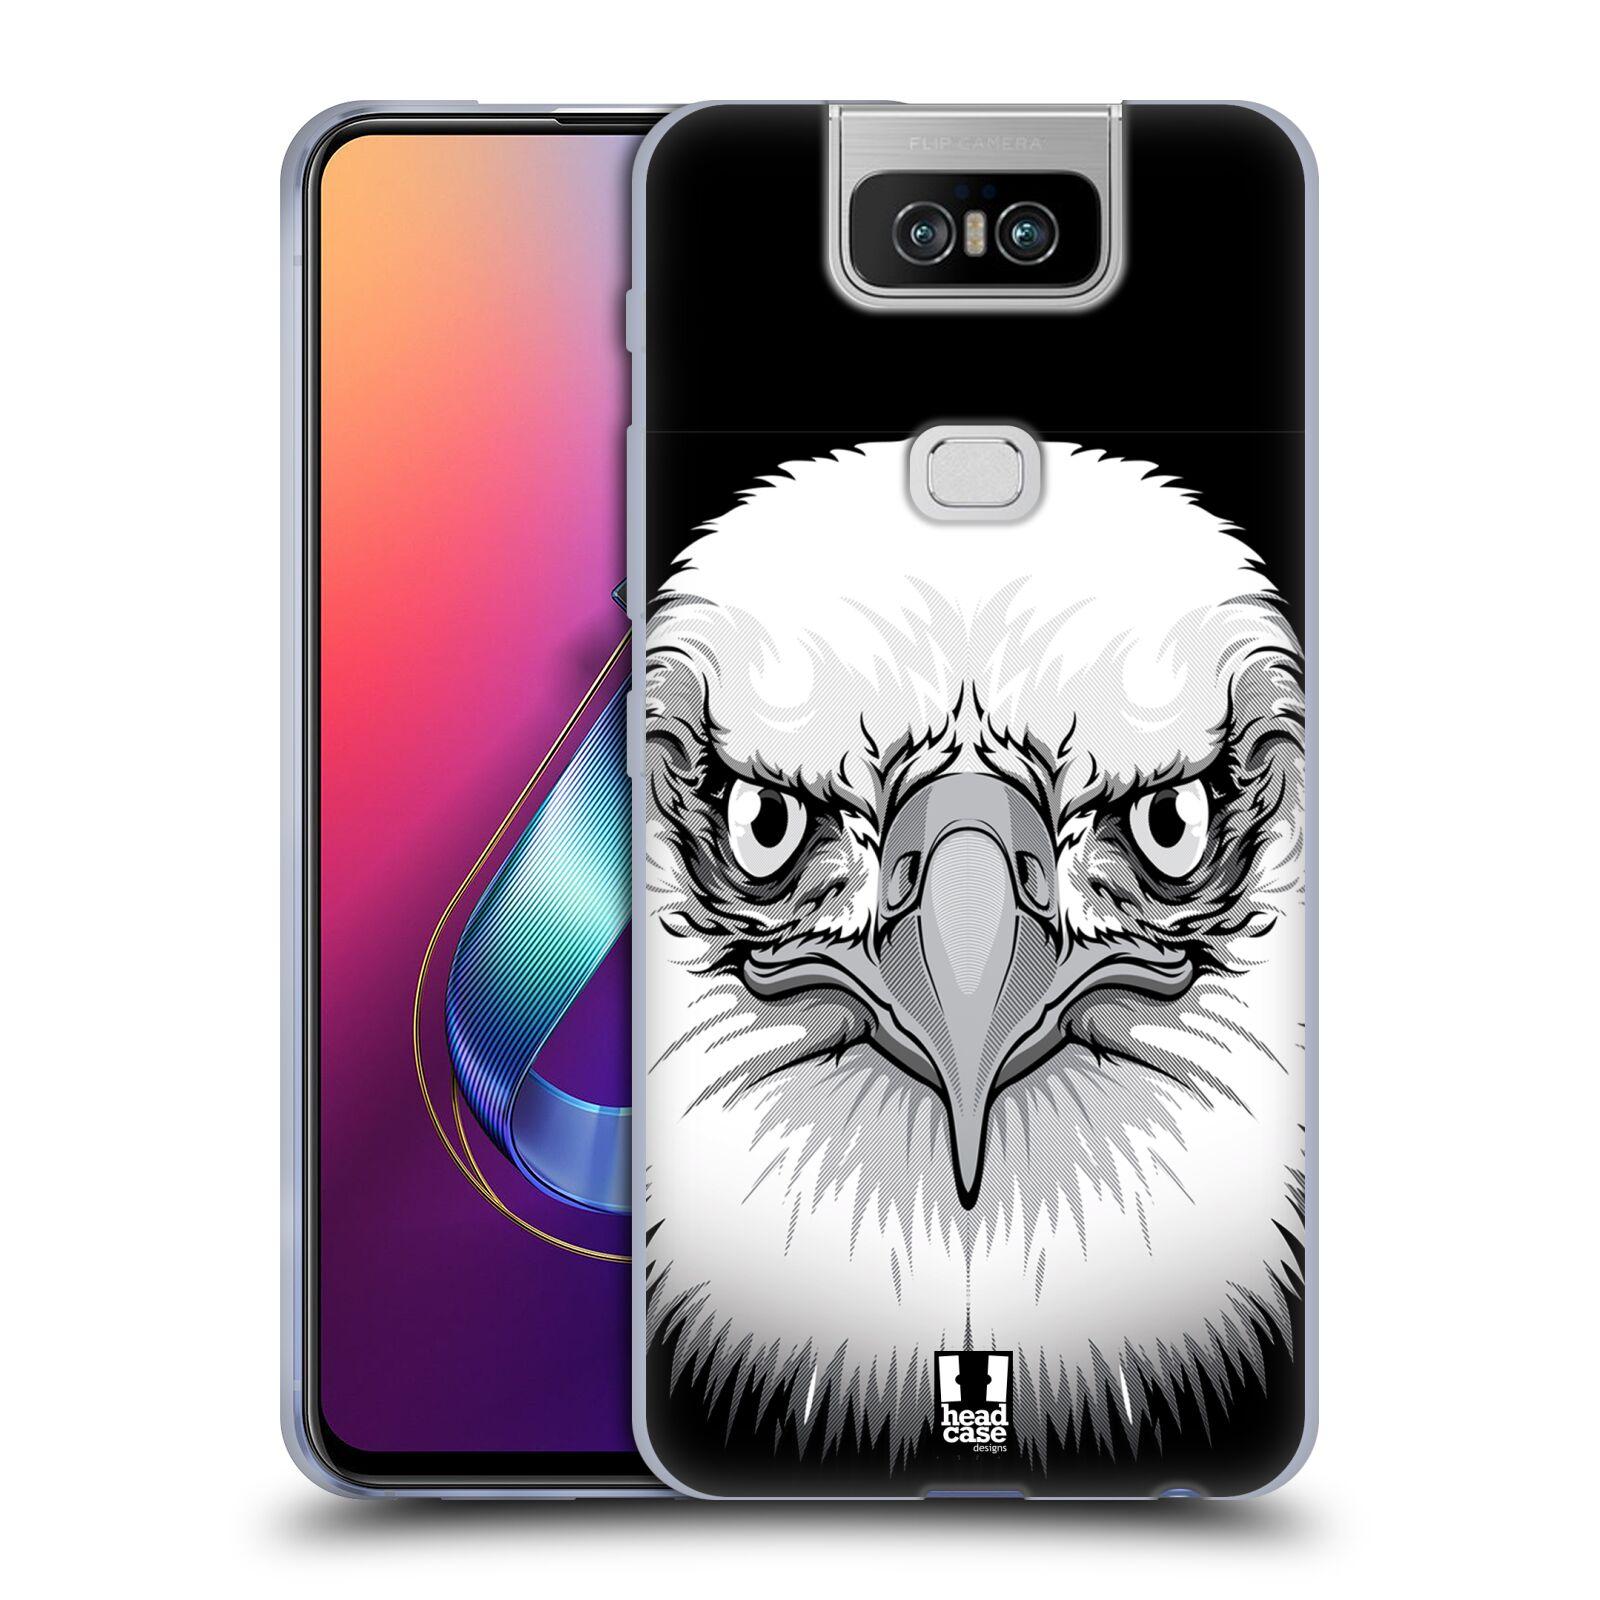 Silikonové pouzdro na mobil Asus Zenfone 6 ZS630KL - Head Case - ILUSTROVANÝ OREL